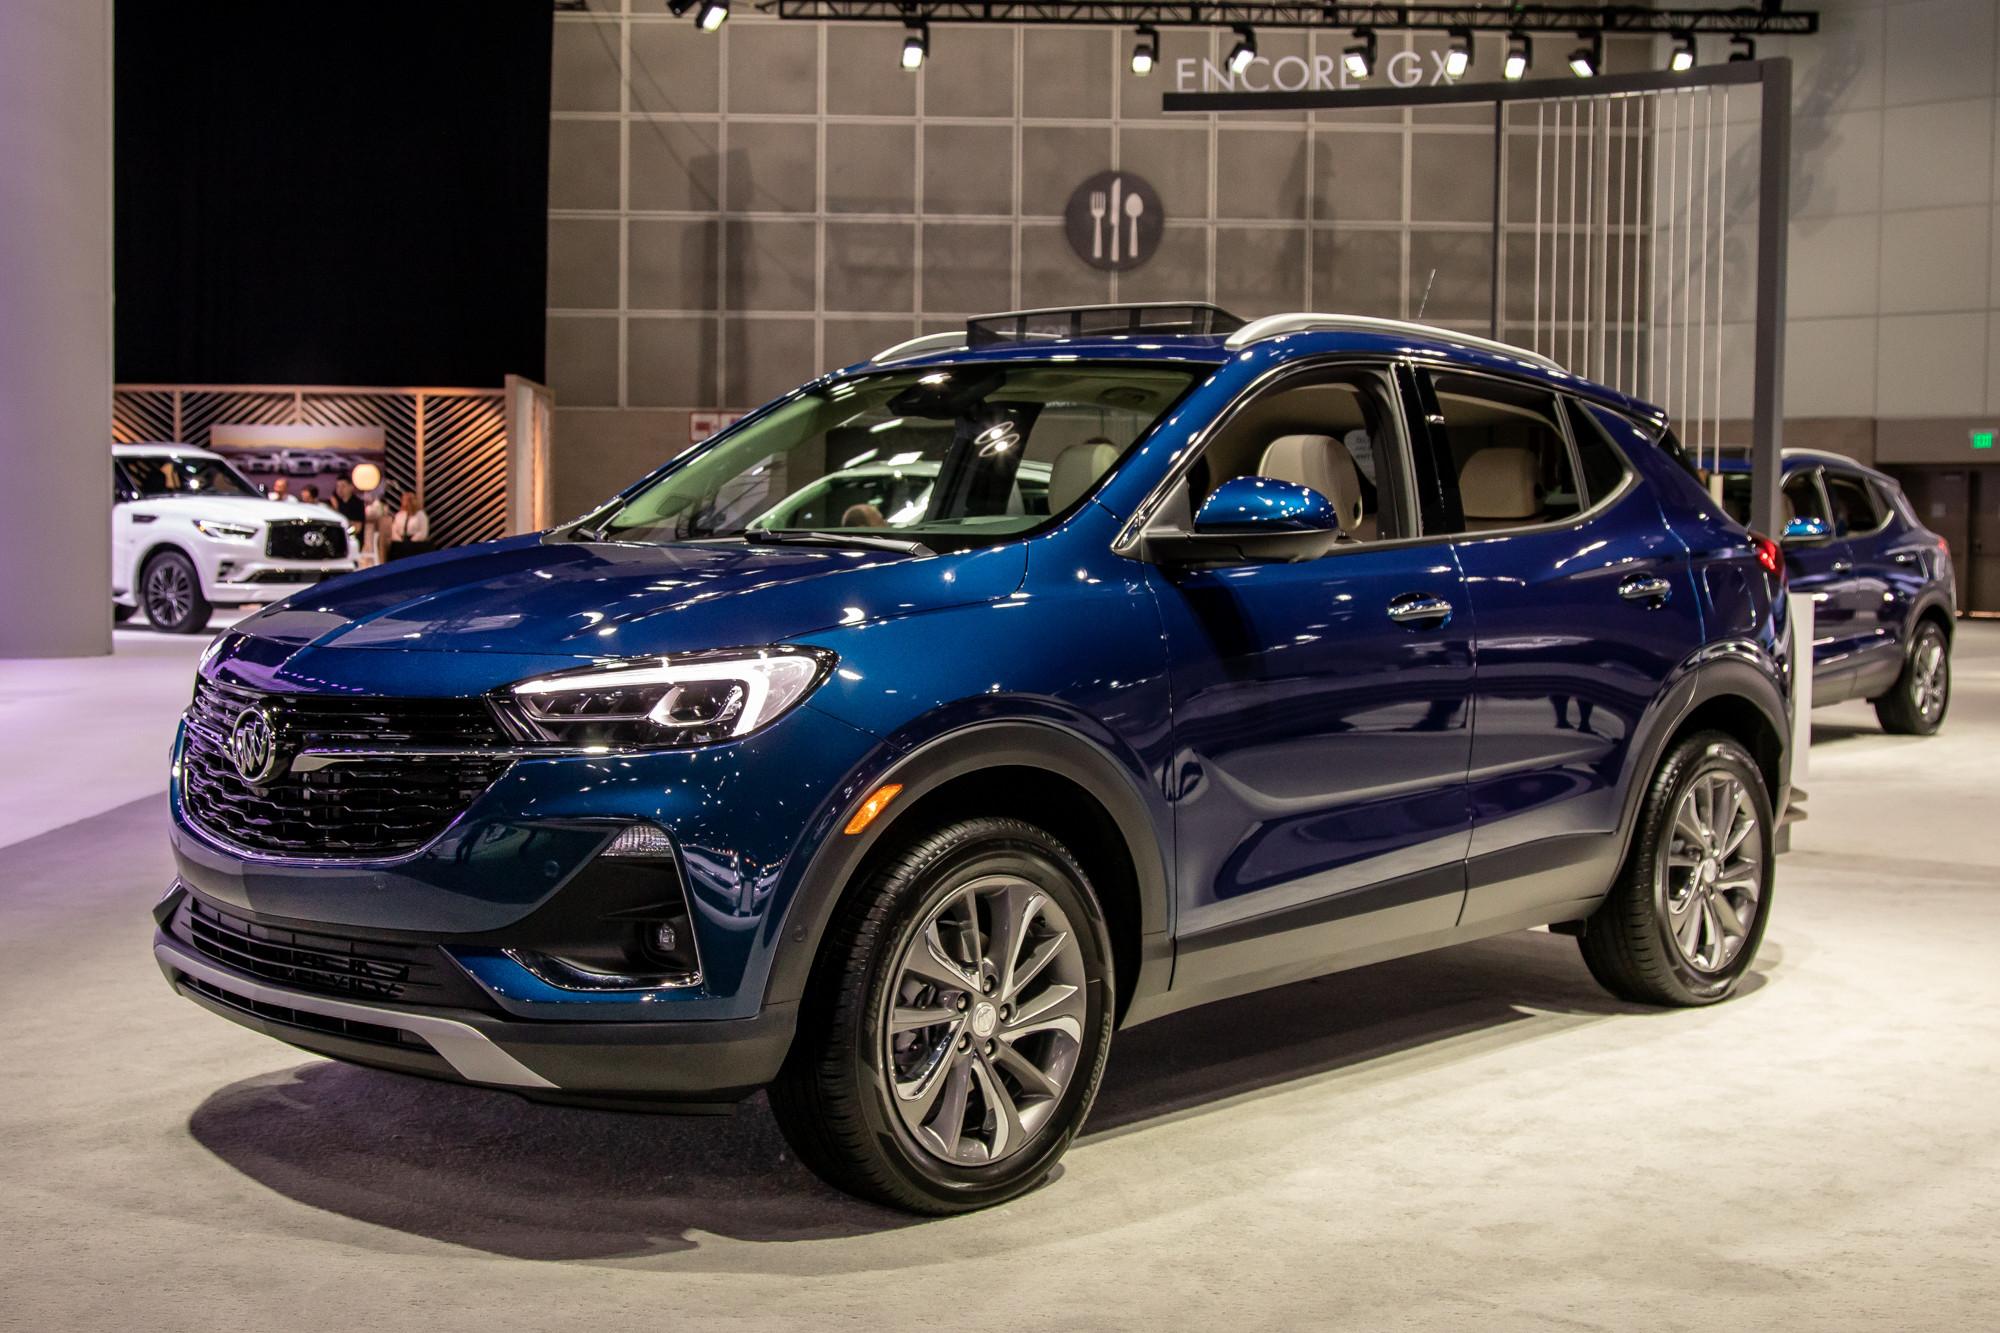 buick-encore-gx-2020-cl-01-exterior-blue.jpg